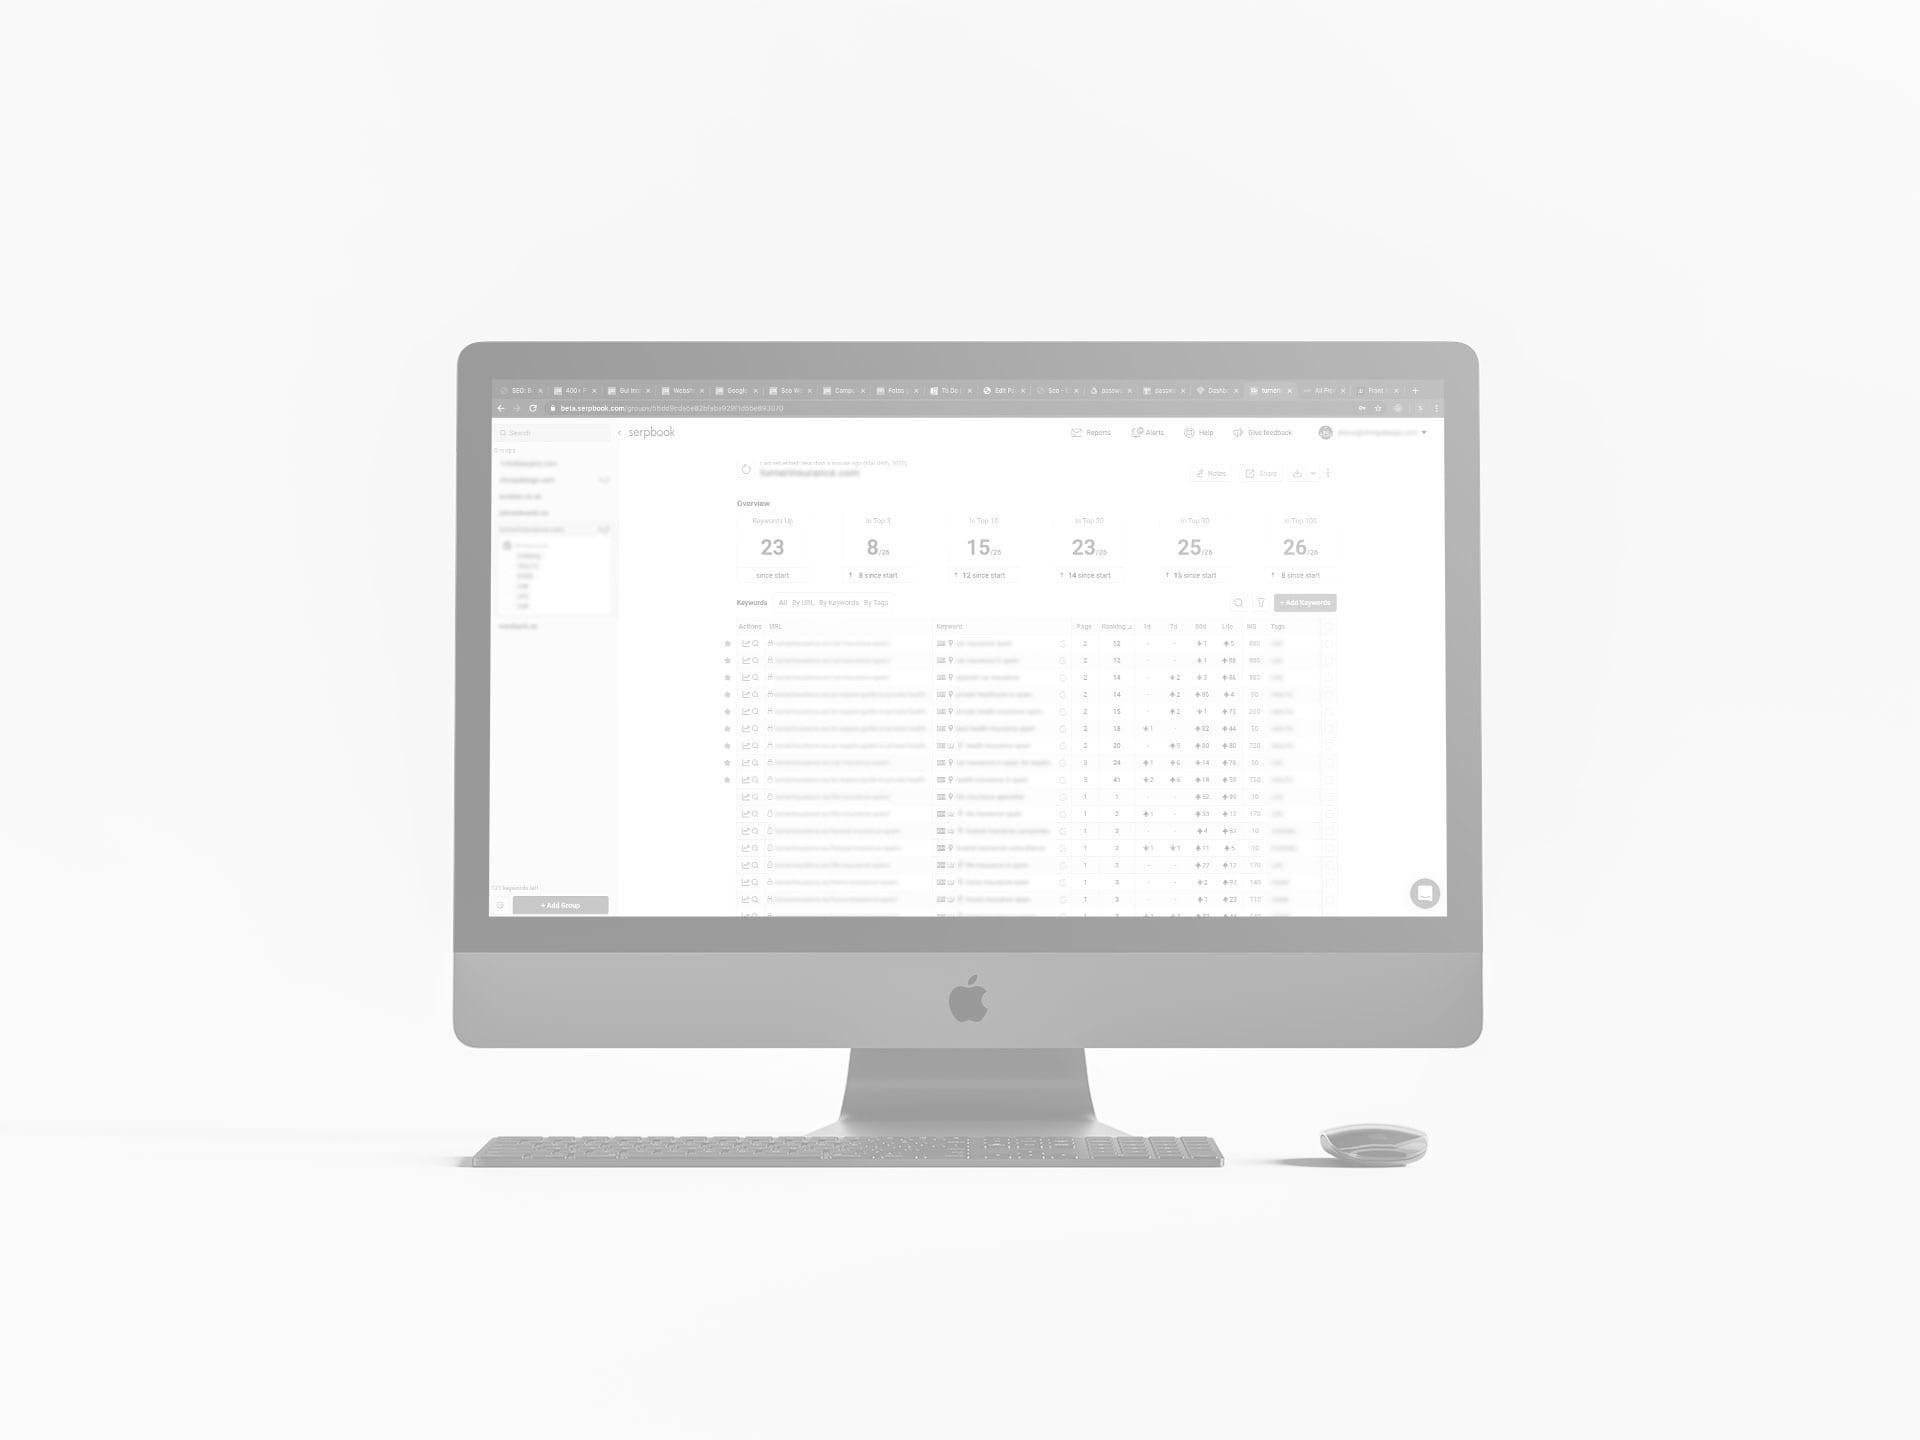 seo mac serpbook keywords tracker